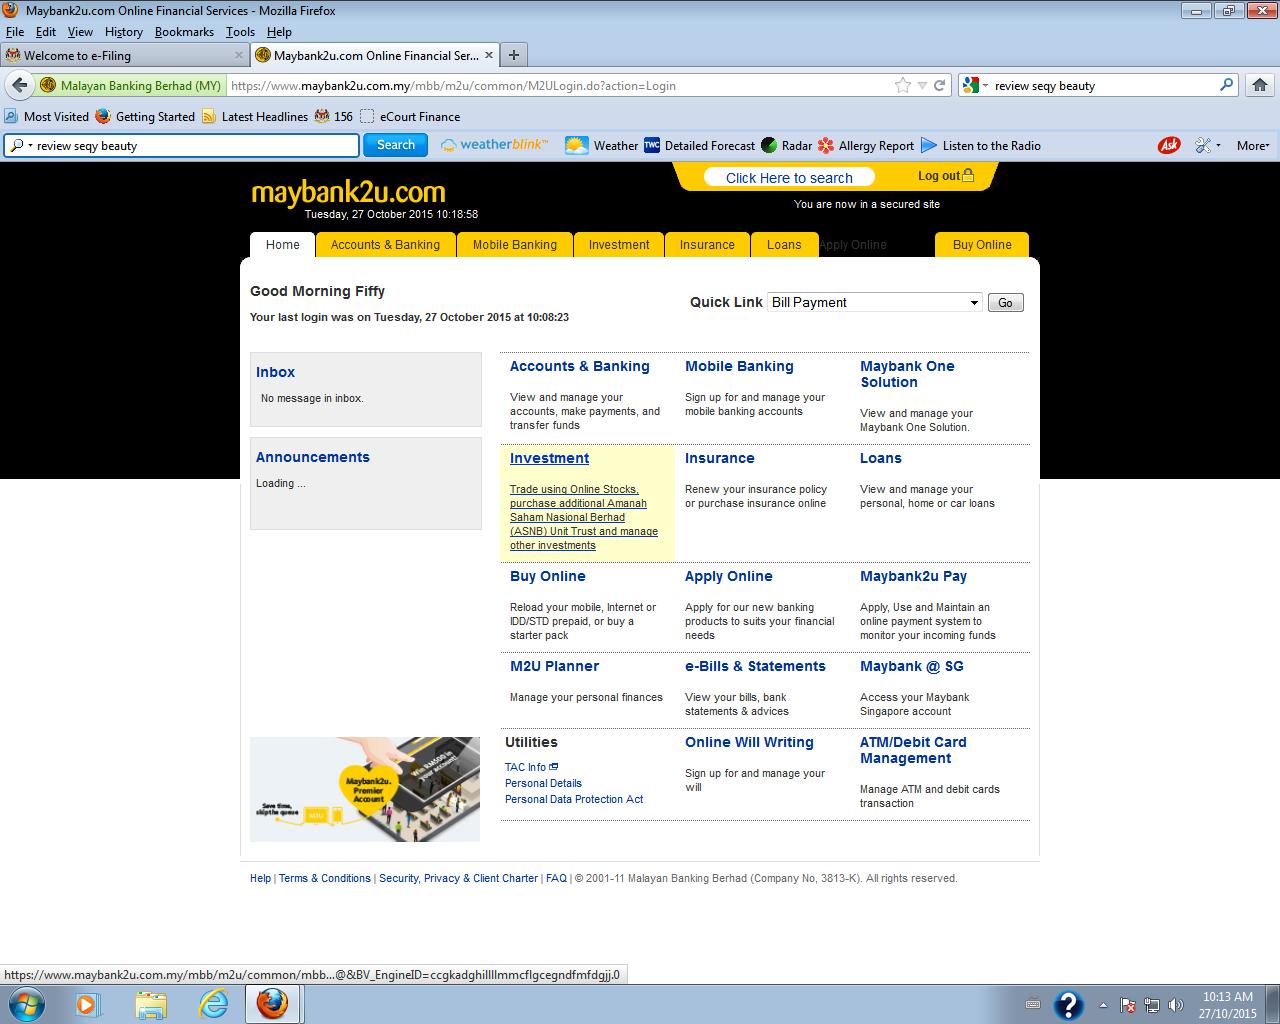 Asnb Pejabat Pos : Cara Transfer Duit Secara Online Ke ...